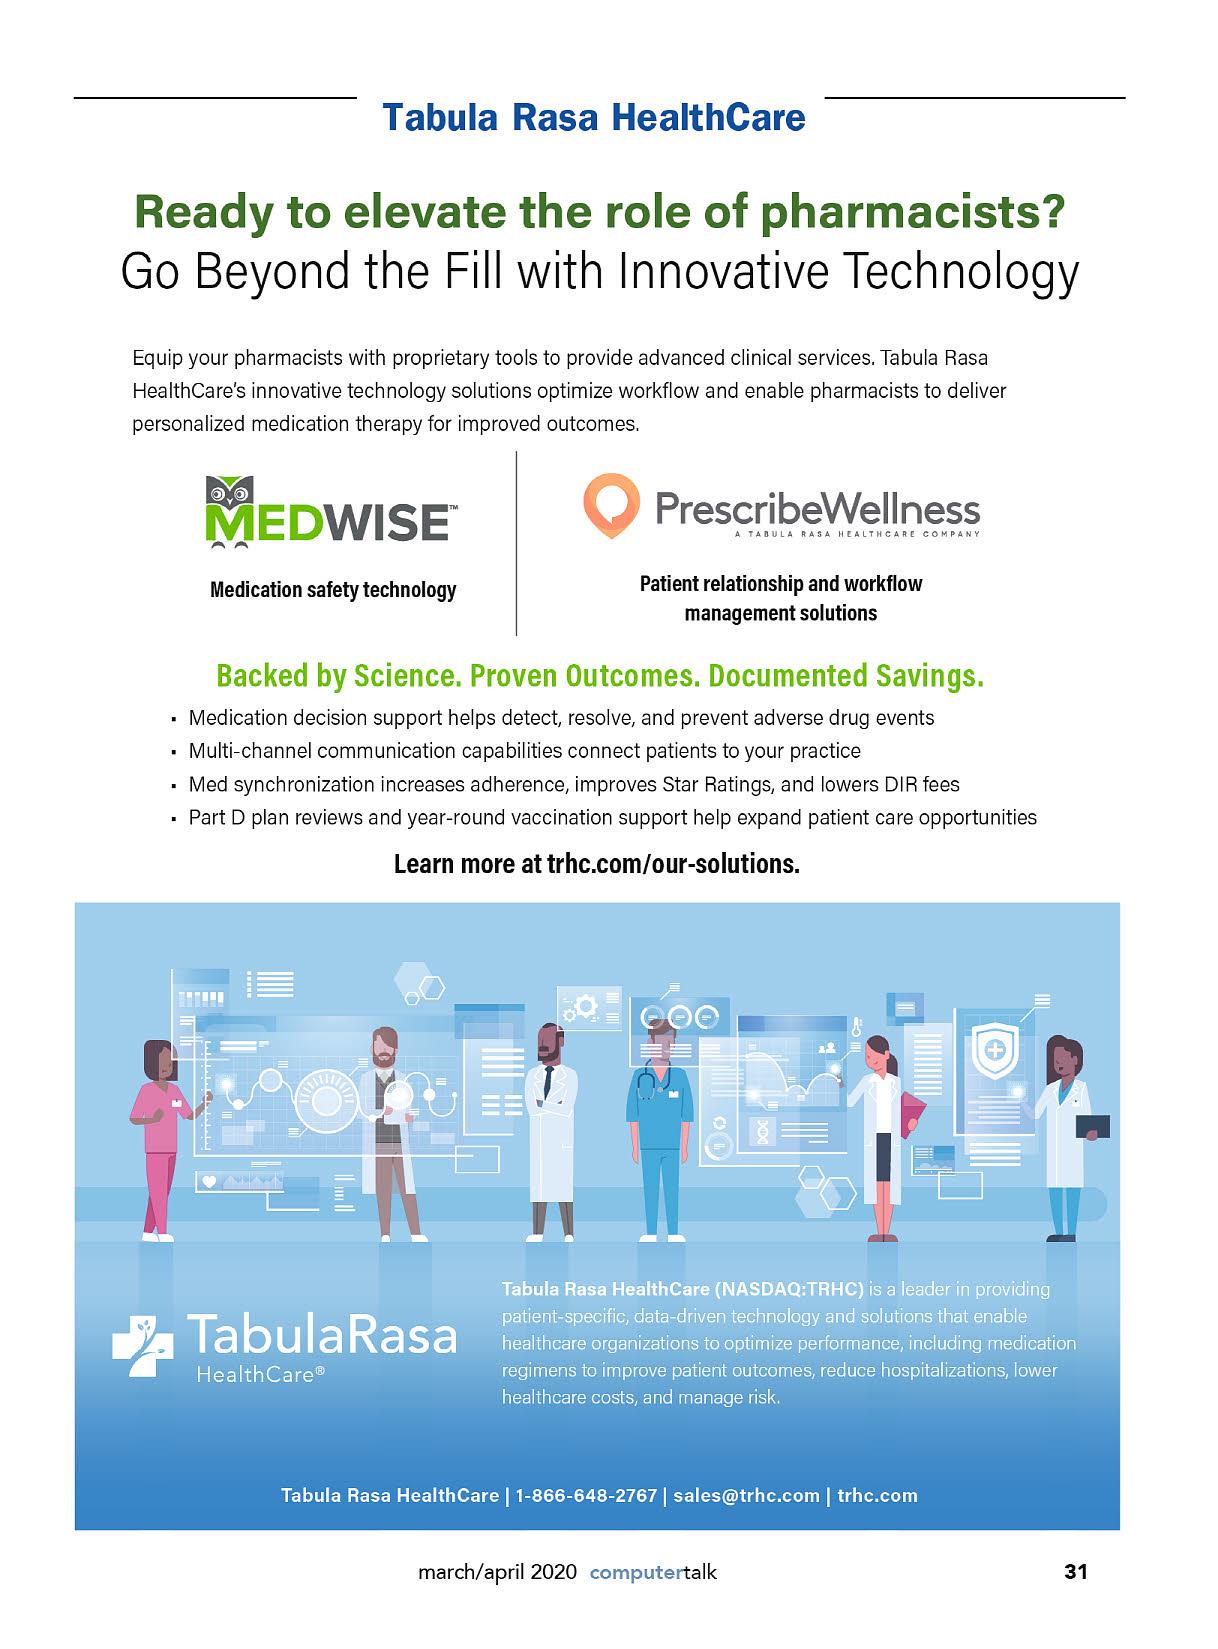 CT Buyers Guide 2020 TRHC Tabula Rasa HealthCare